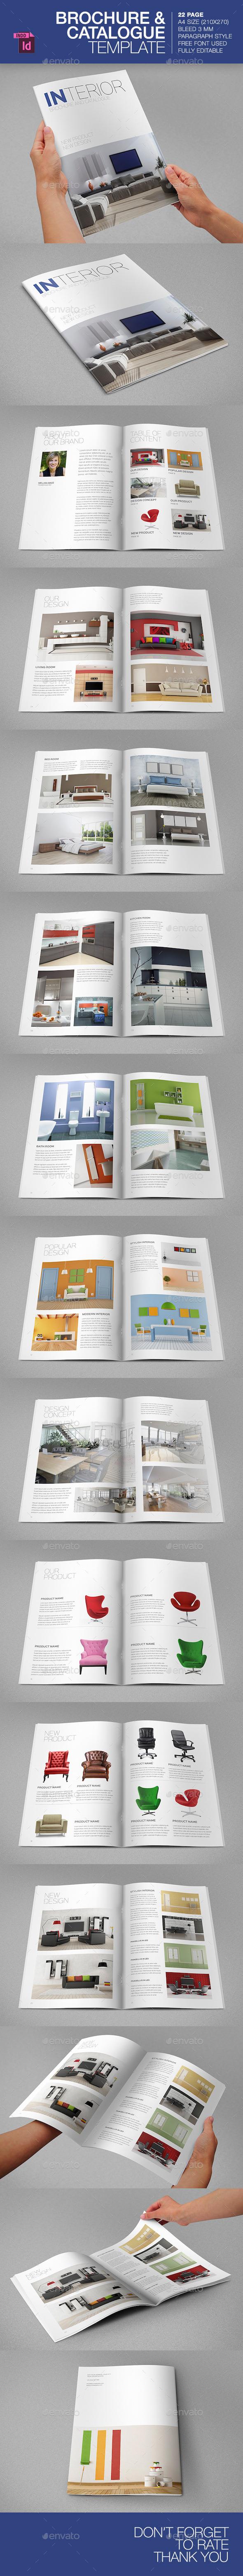 GraphicRiver Brochure Catalogue Template 9357459